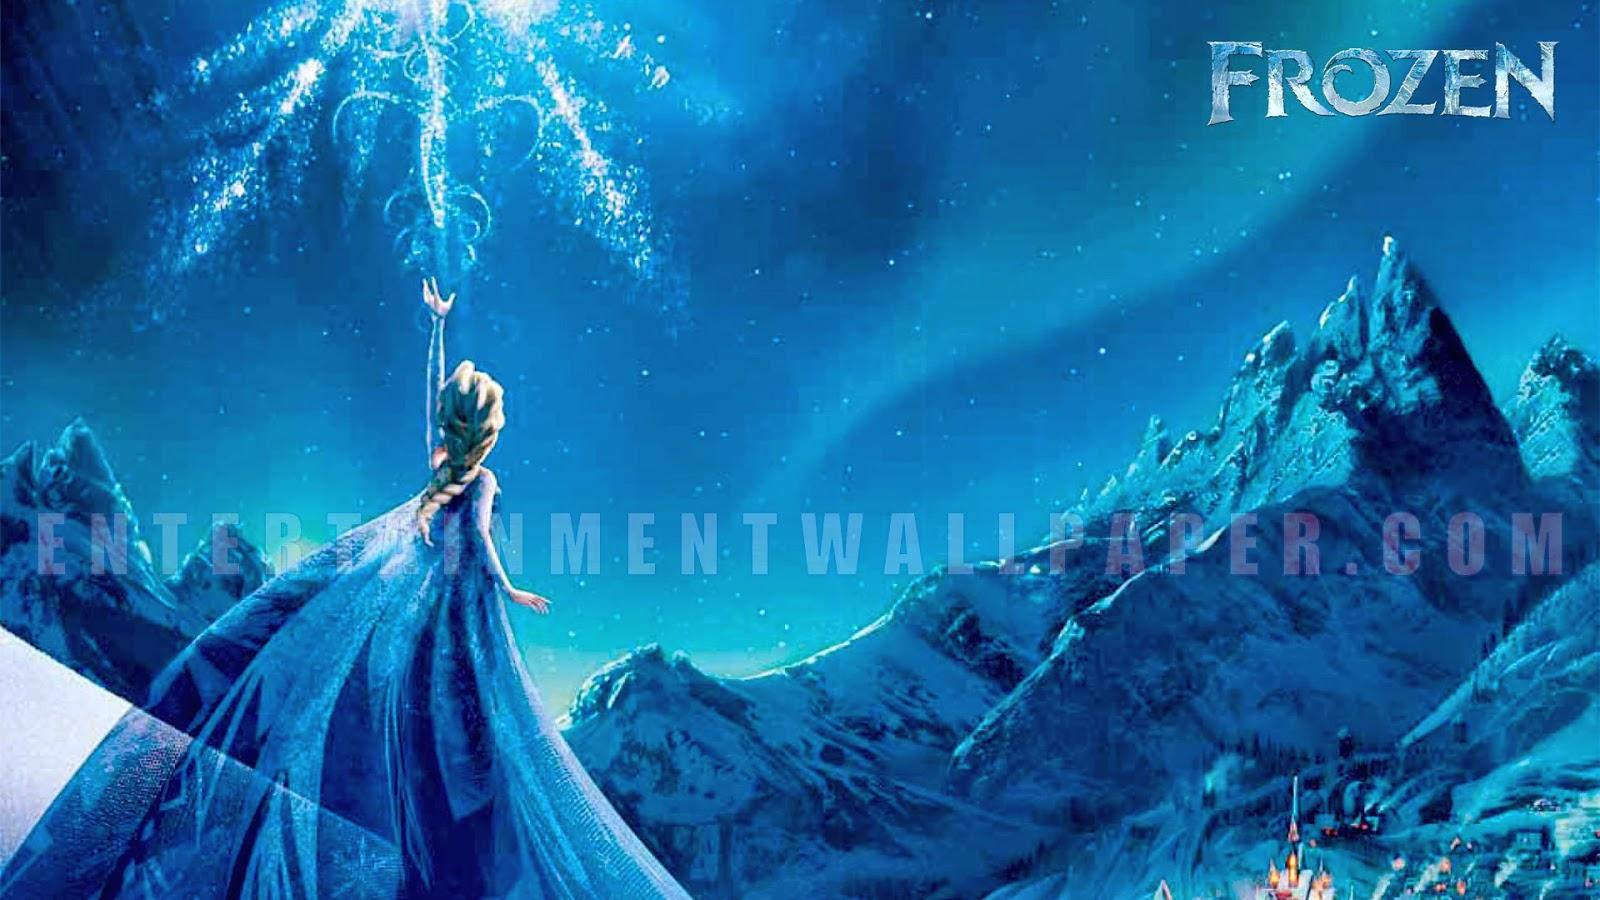 Frozen HD Wallpapers   Disnep 3D Movie   HD Wallpapers Blog 1600x900